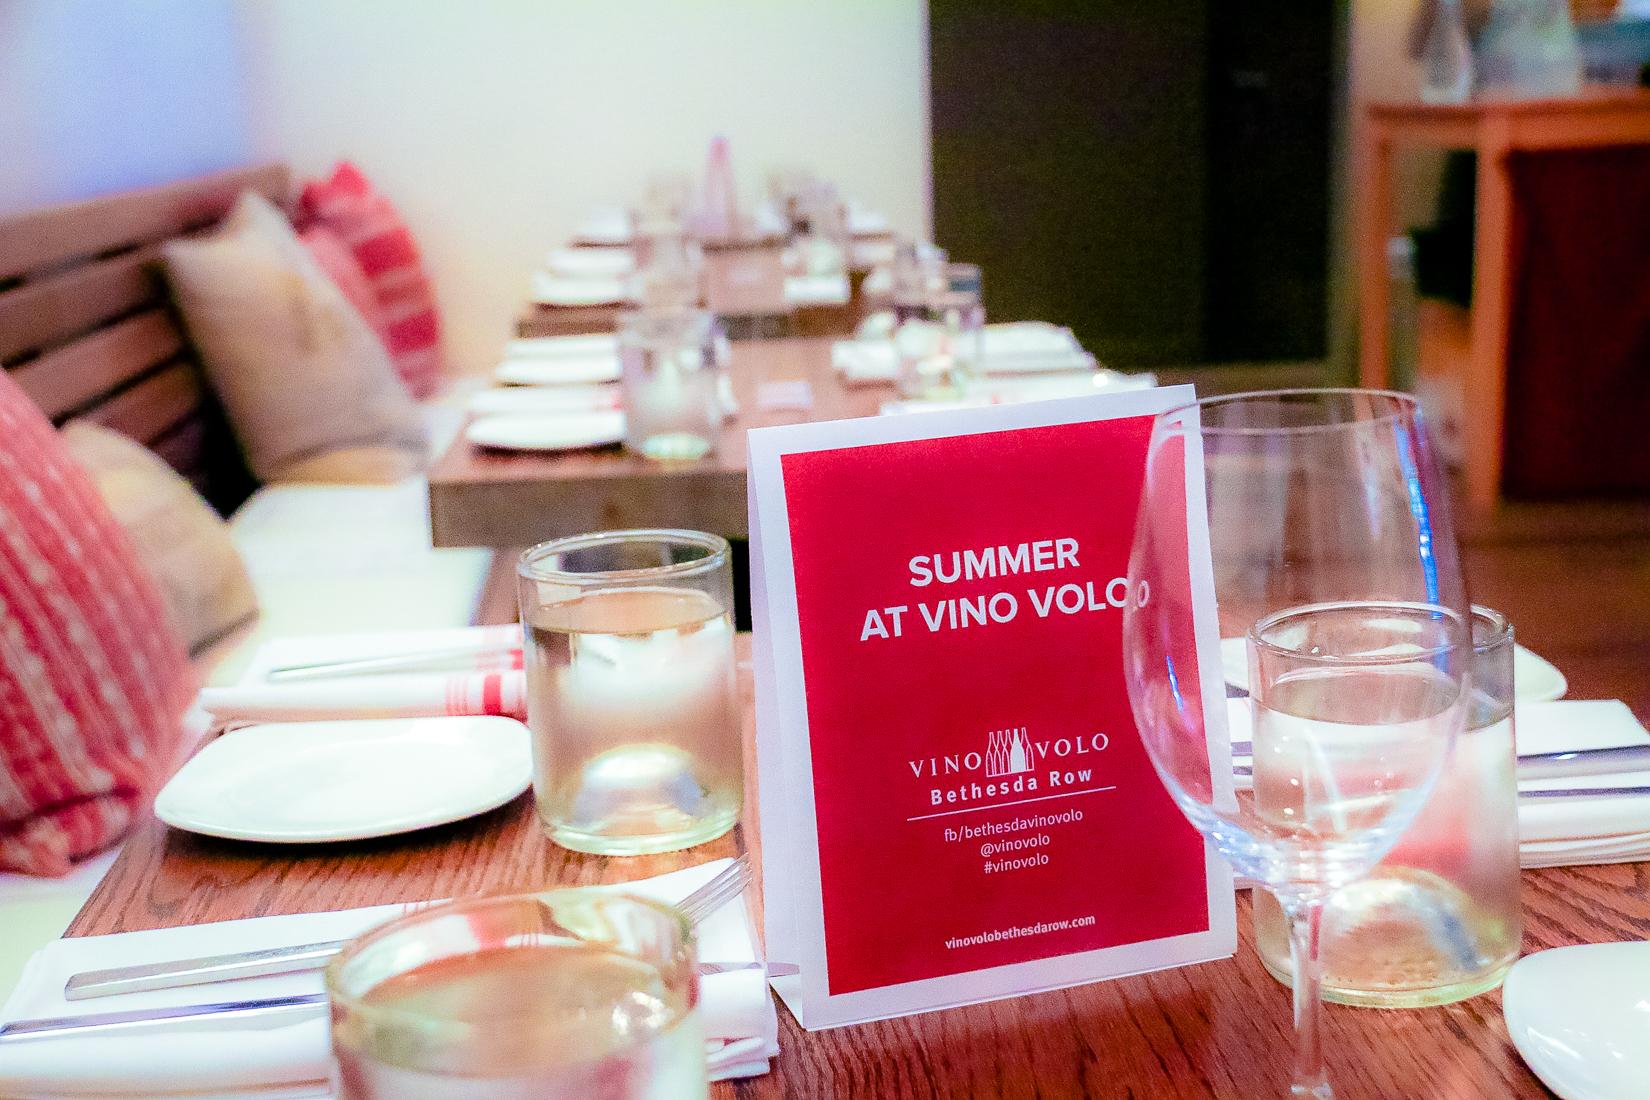 Summer in Vino Volo Bethesda 2014